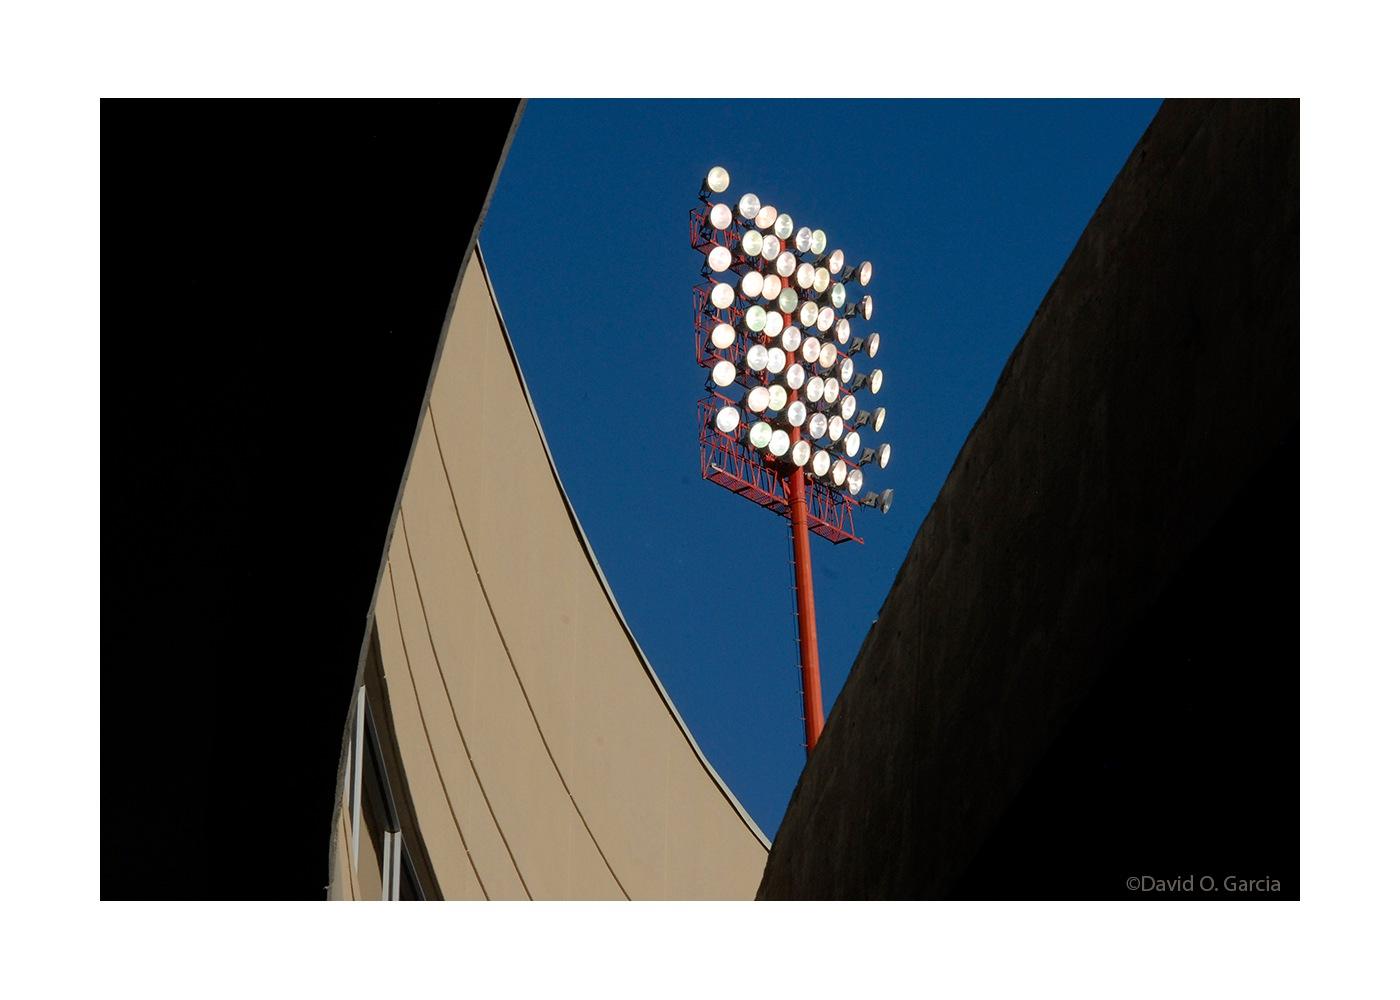 Stadium Lights by David Garcia